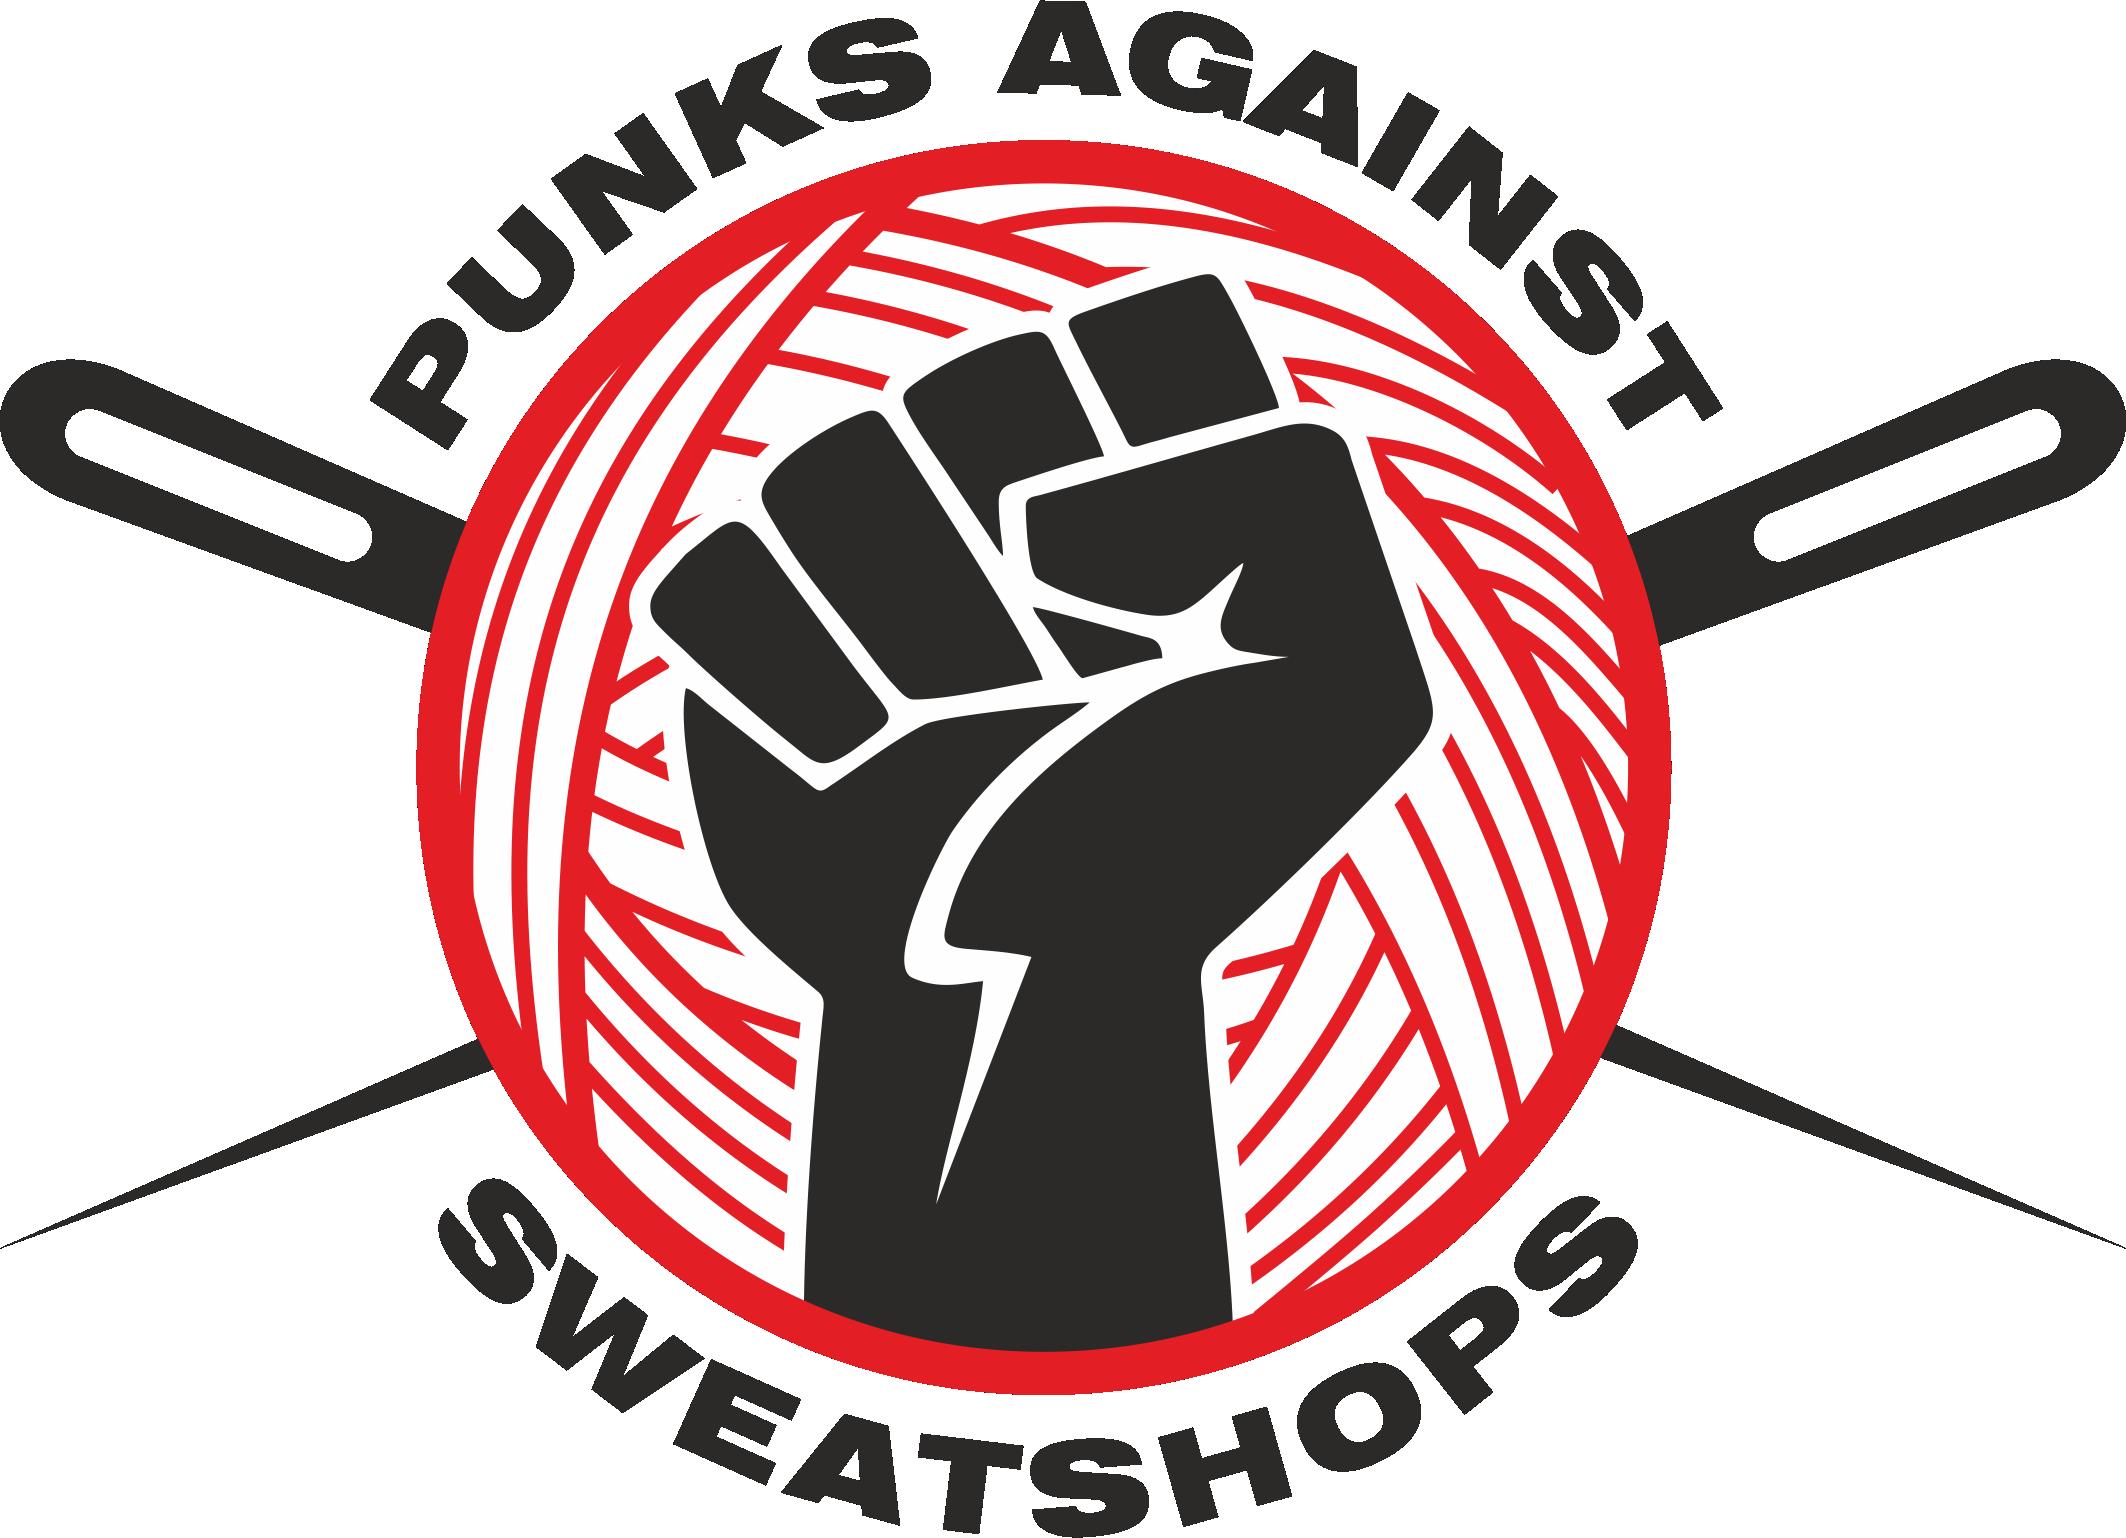 https://www.punkethics.com/wp-content/uploads/2019/05/PUNKS-AGAINST-SWEATSHOPS-RED-BLACK.png